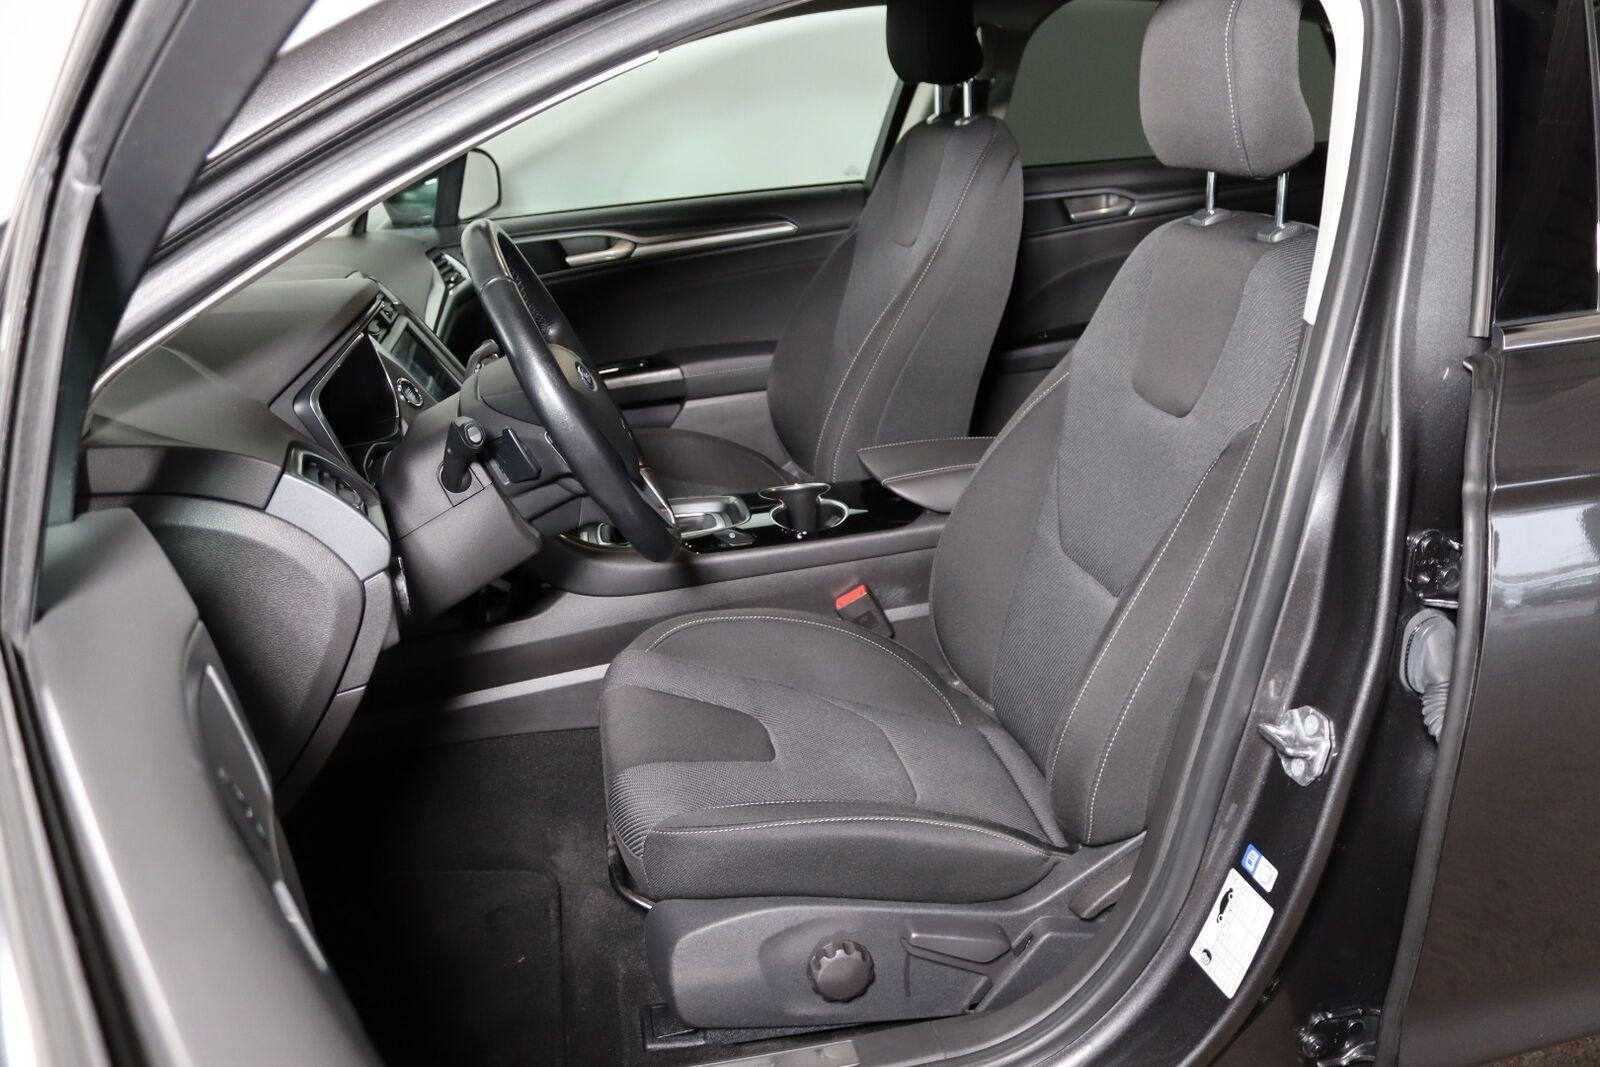 Ford Mondeo 2,0 TDCi 180 Titanium aut. - billede 4